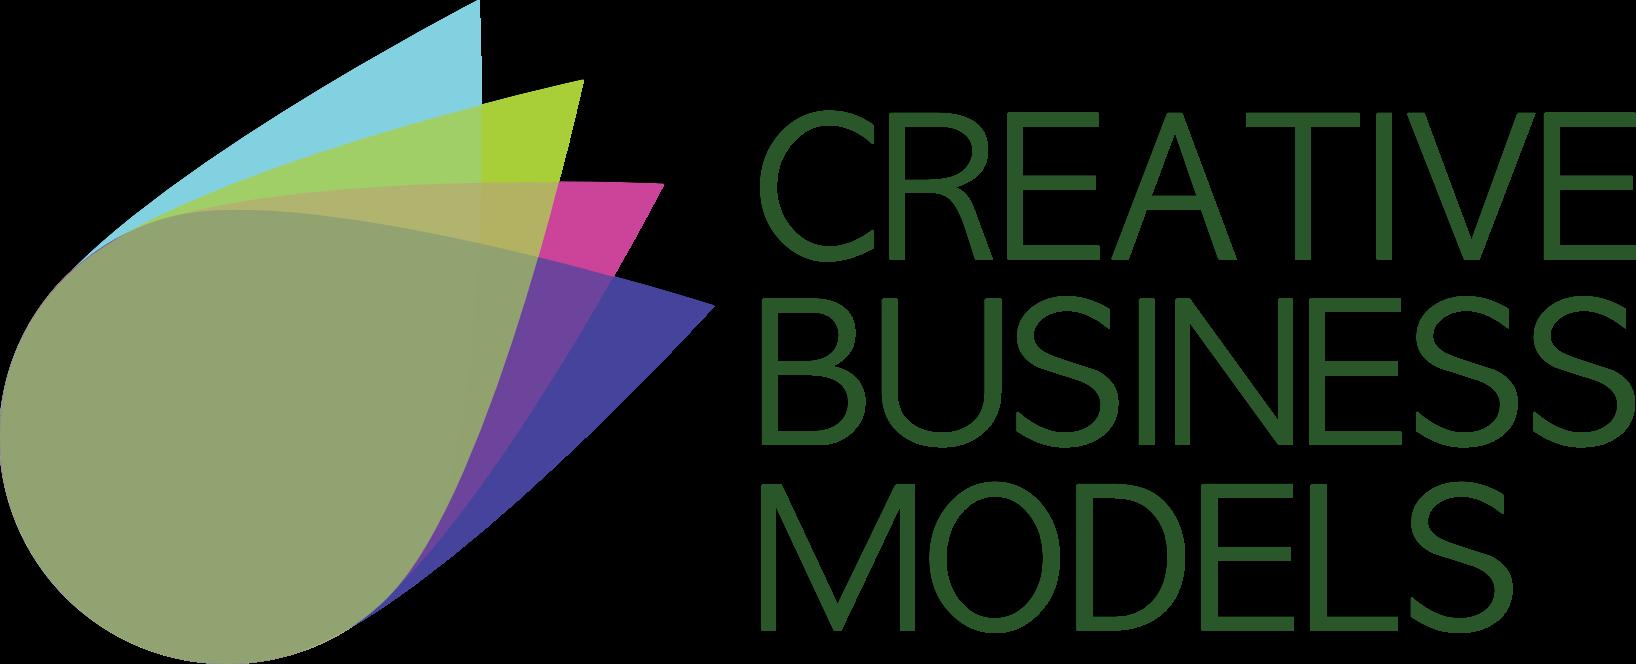 Creative Business Models